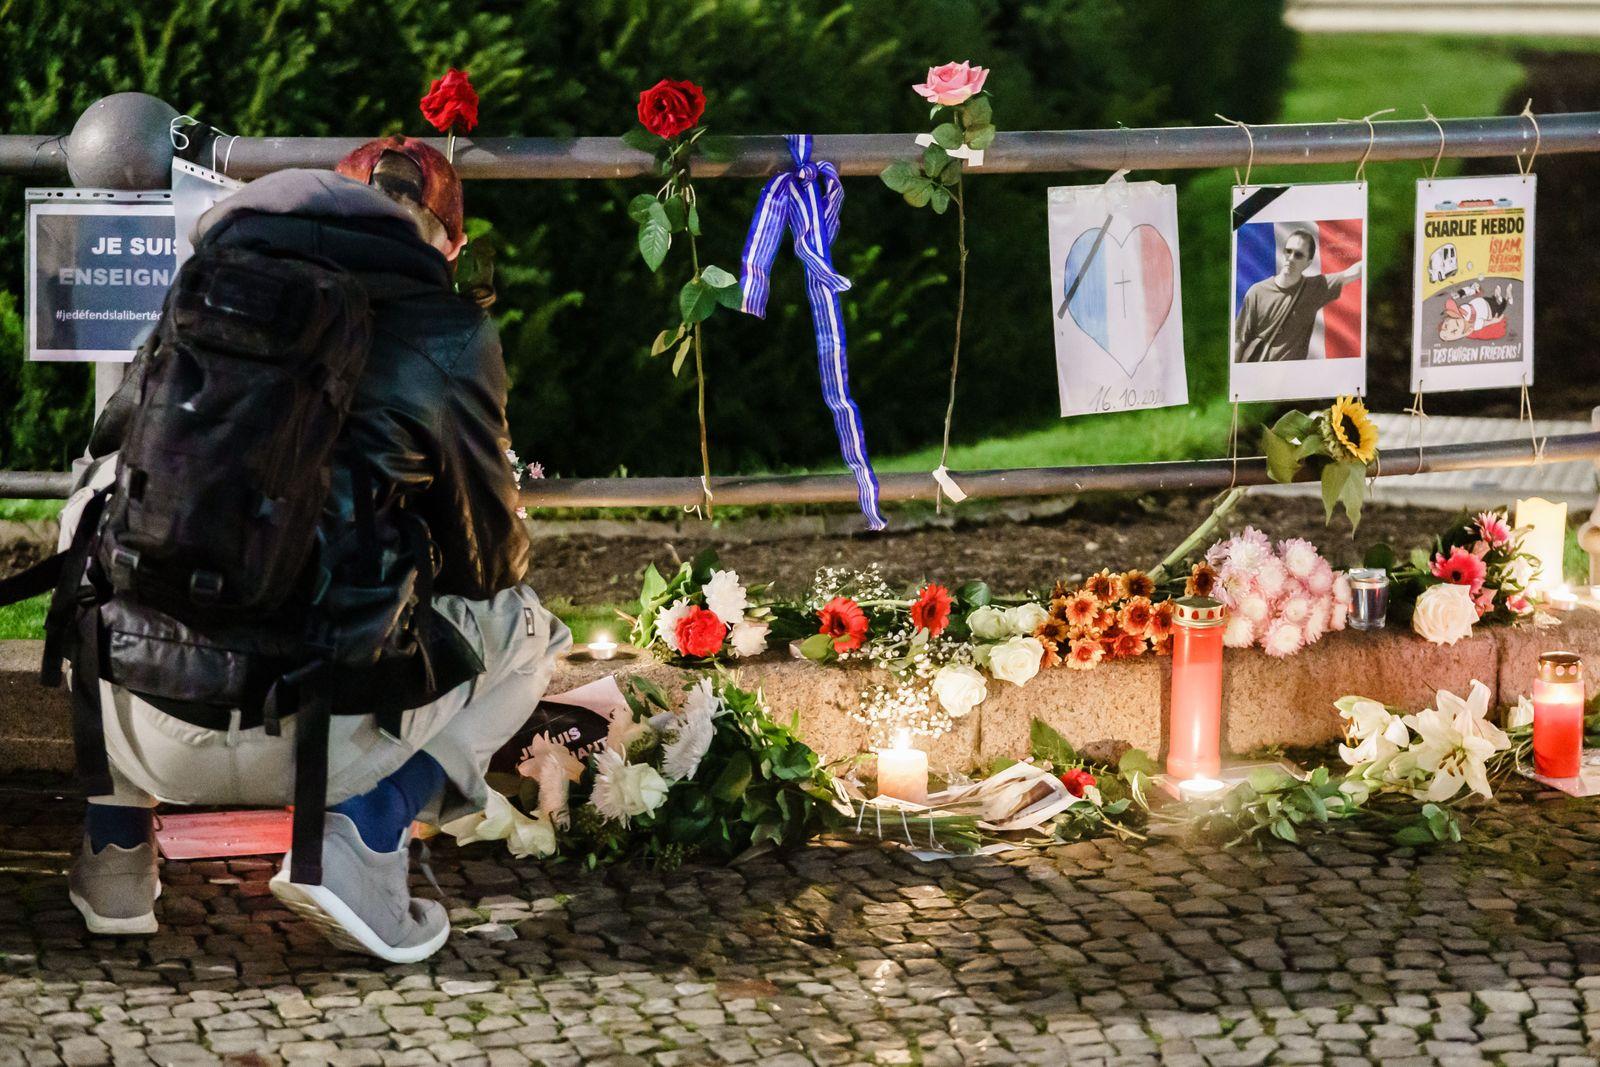 Vigil in Berlin commemorating killing of teacher Samuel Paty in Paris, Germany - 19 Oct 2020